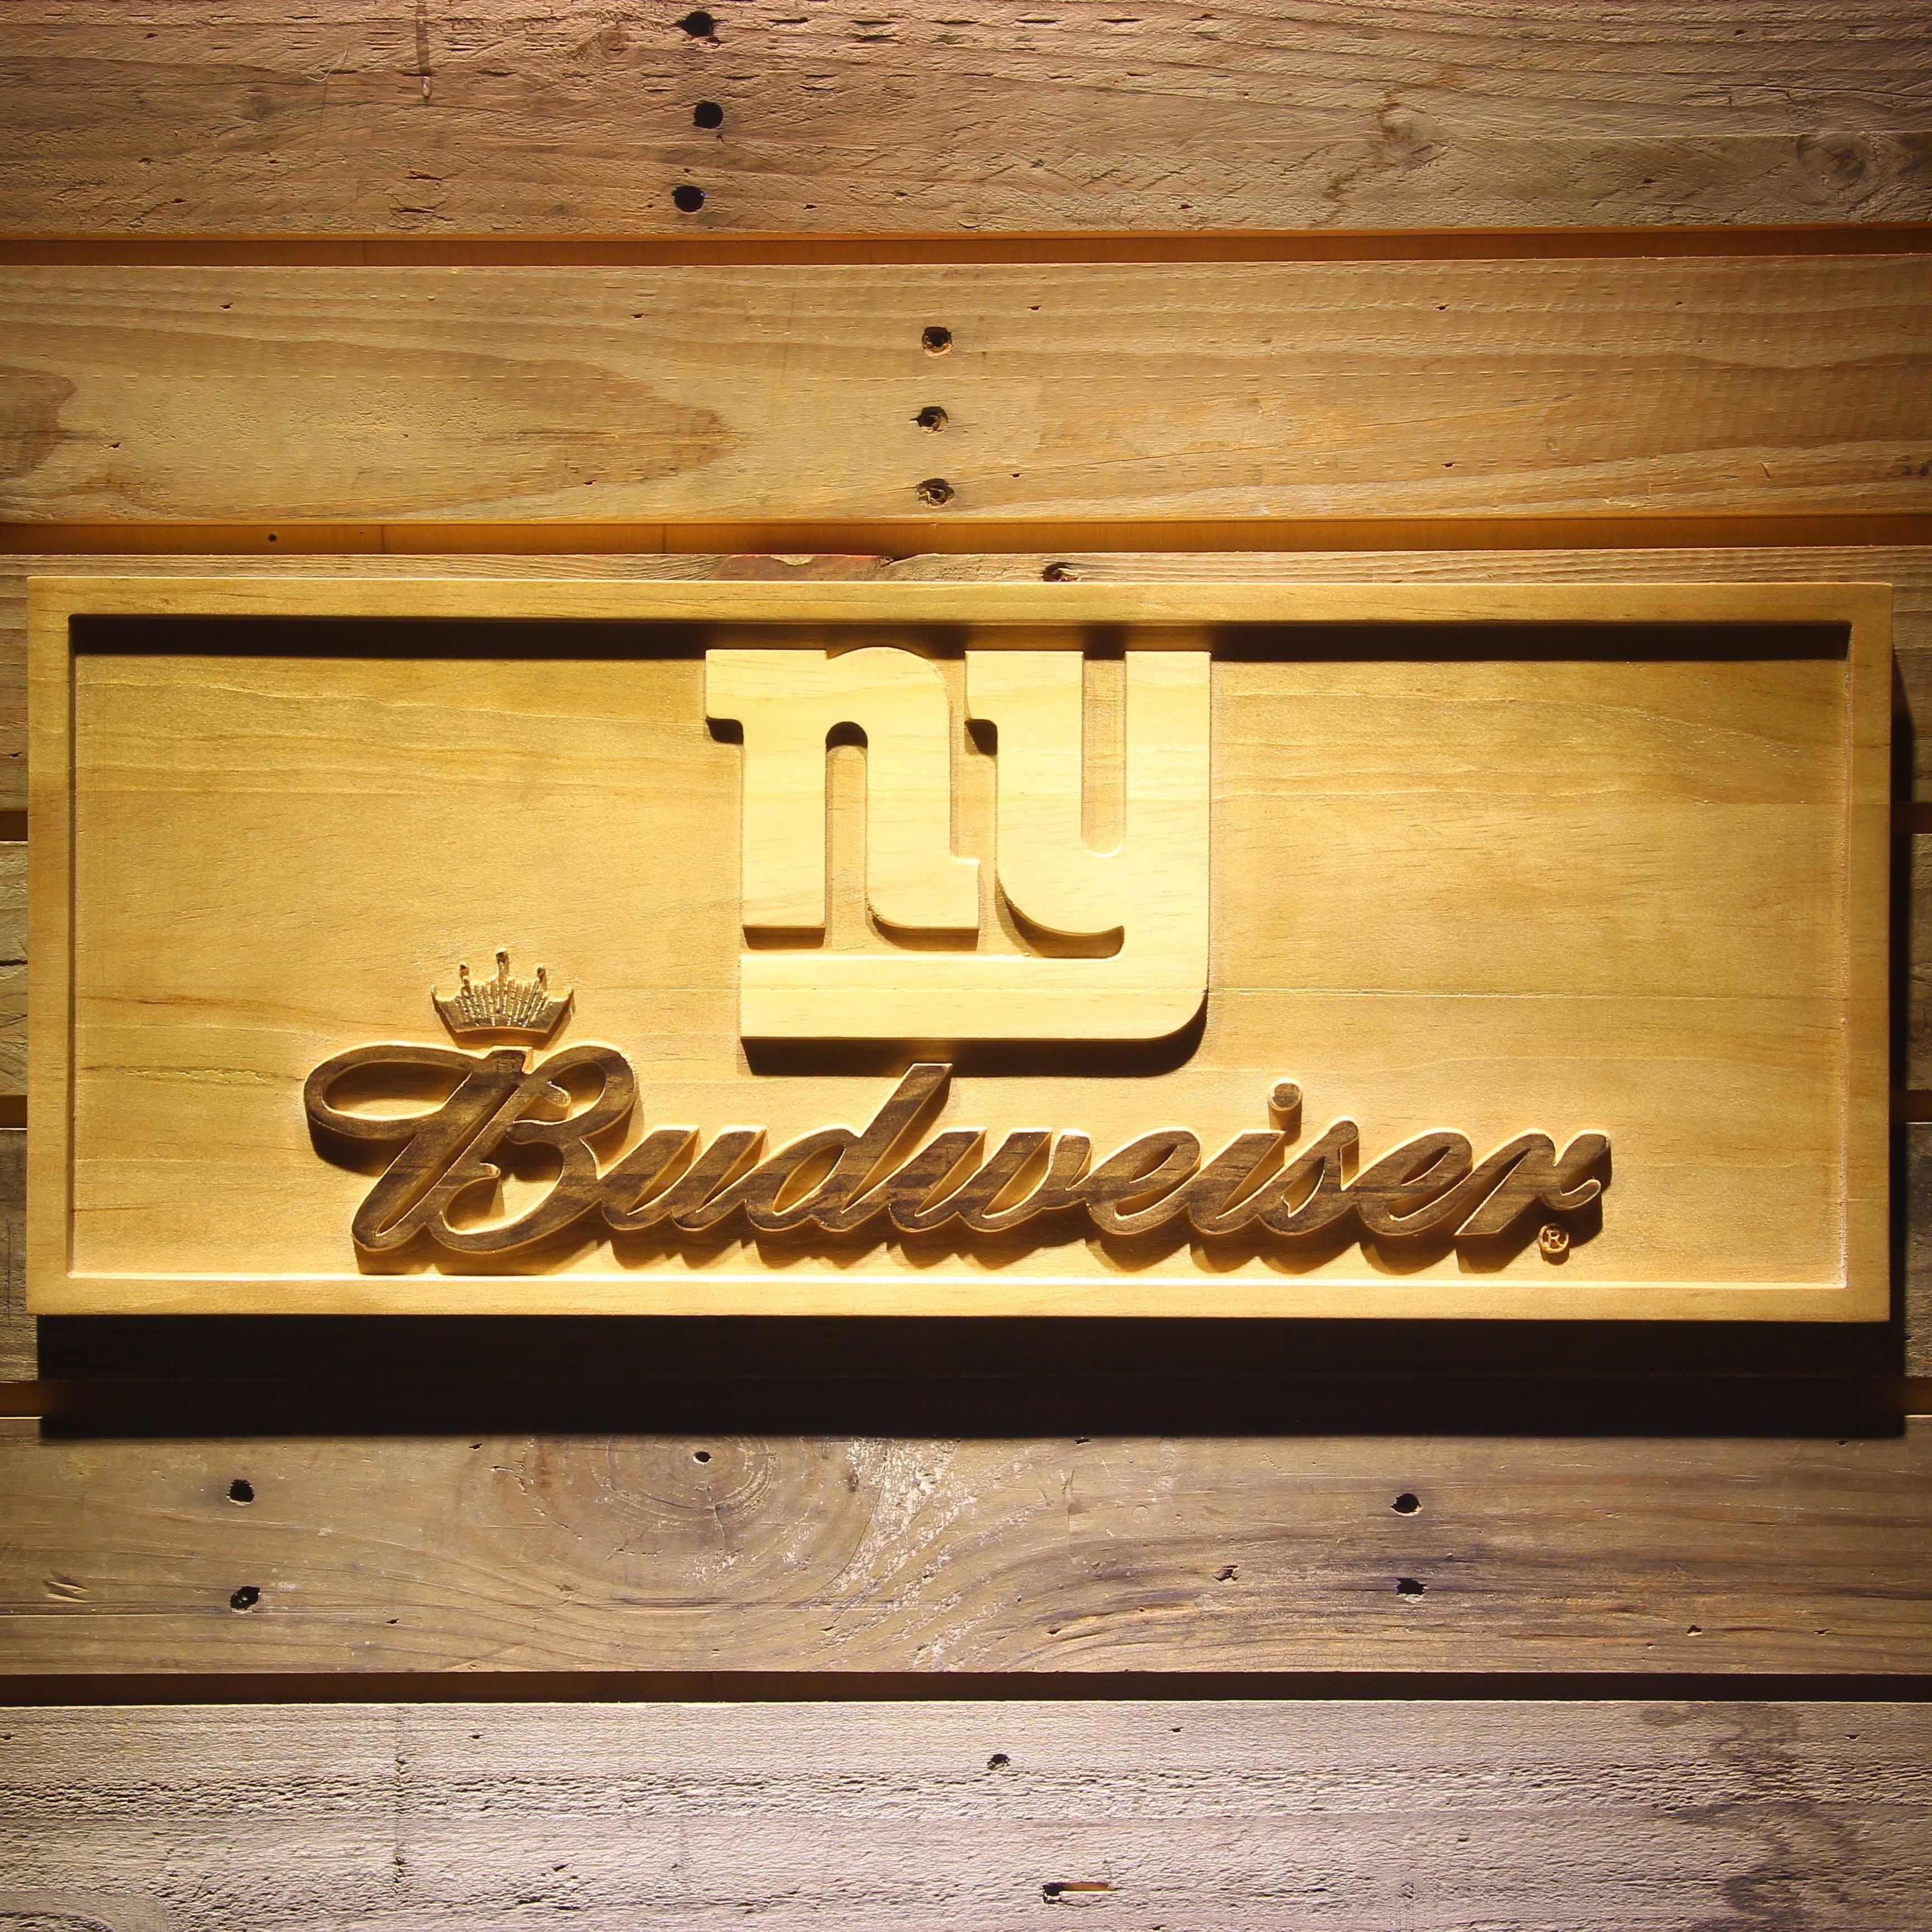 New York Giants Budweiser Beer 3D Wooden Bar Sign #Dubnation #MLB ...